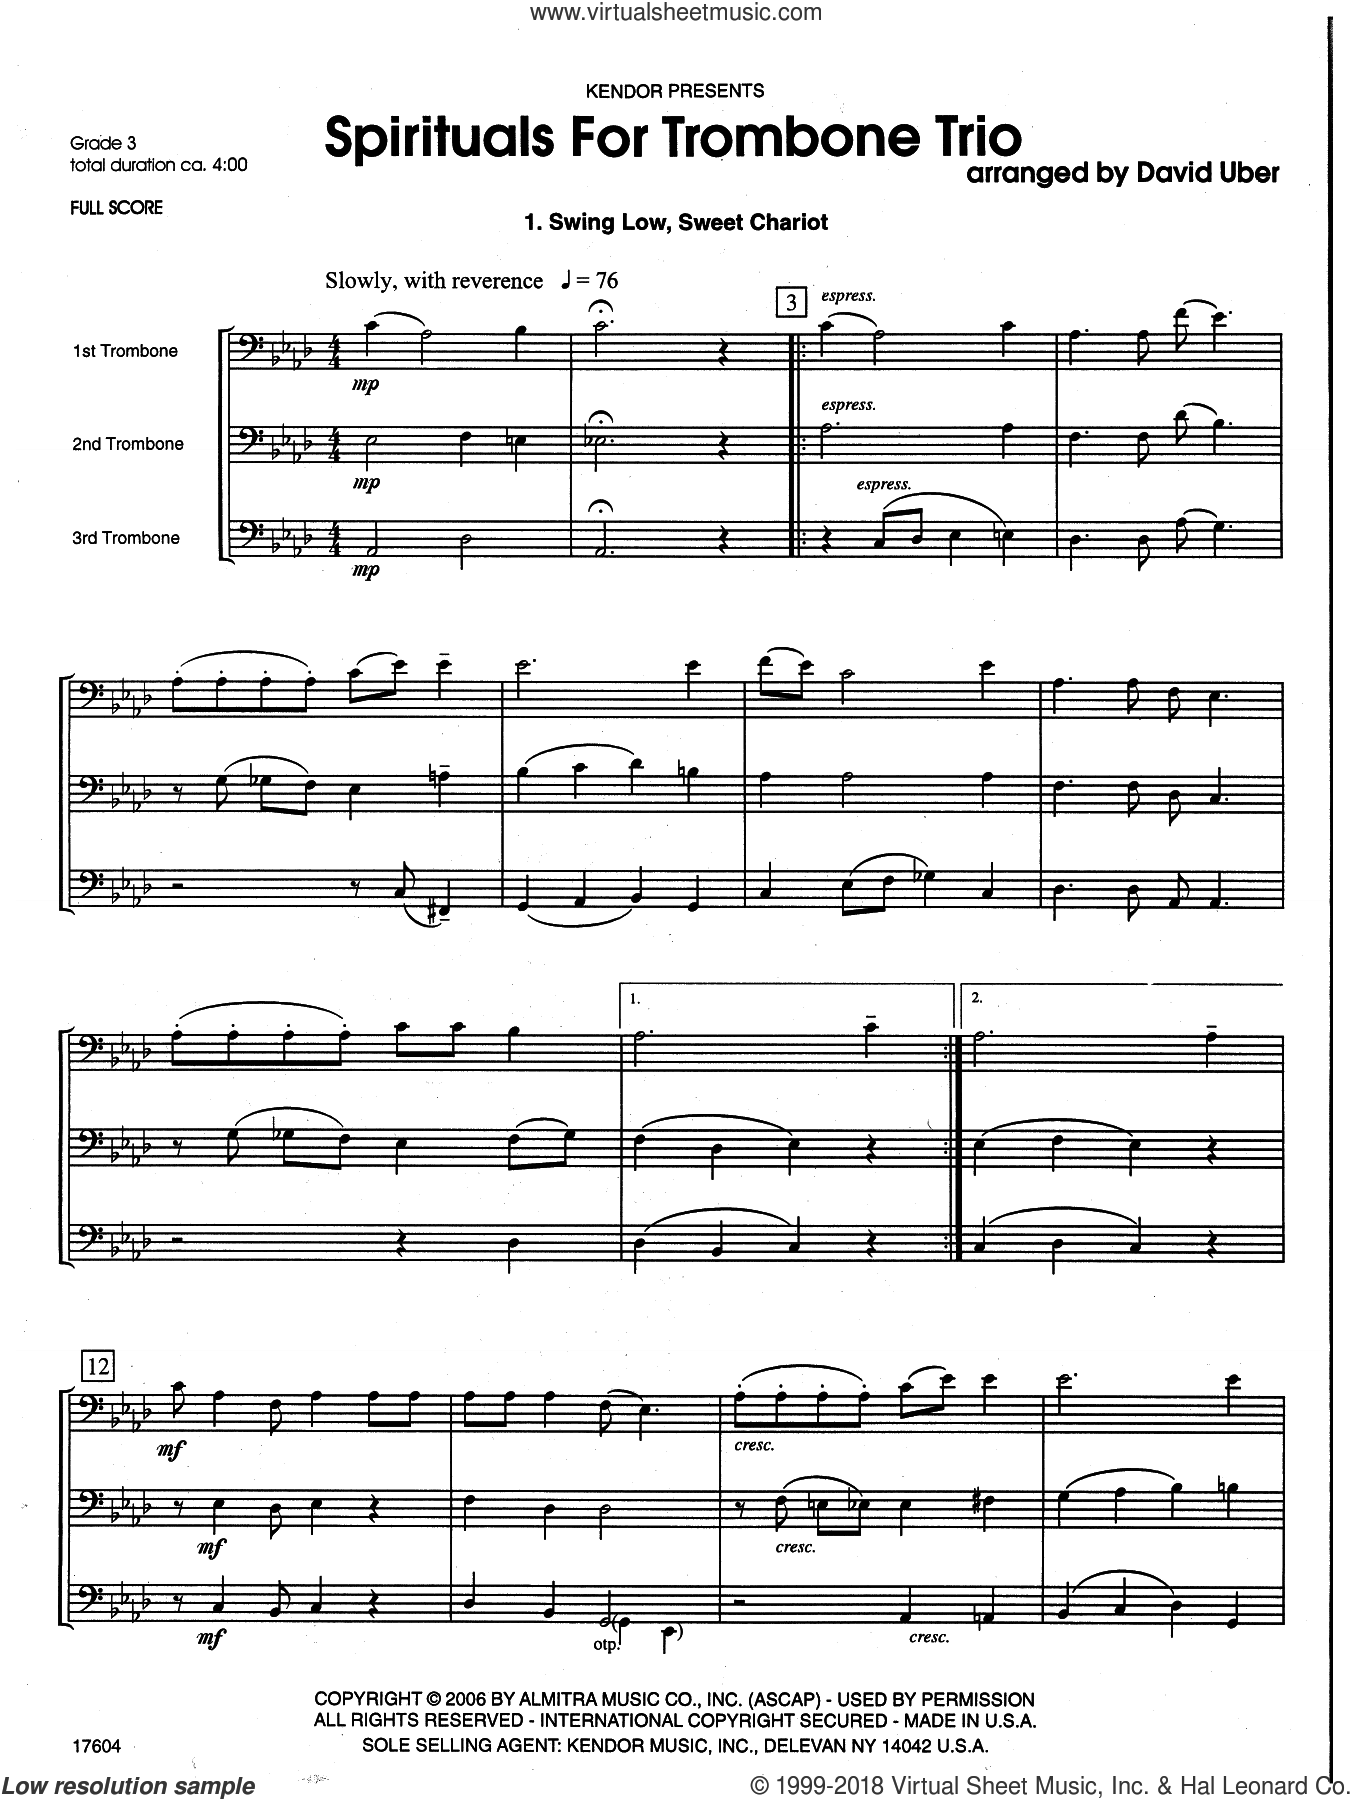 Spirituals For Trombone Trio (COMPLETE) sheet music for trombone trio by David Uber, intermediate skill level